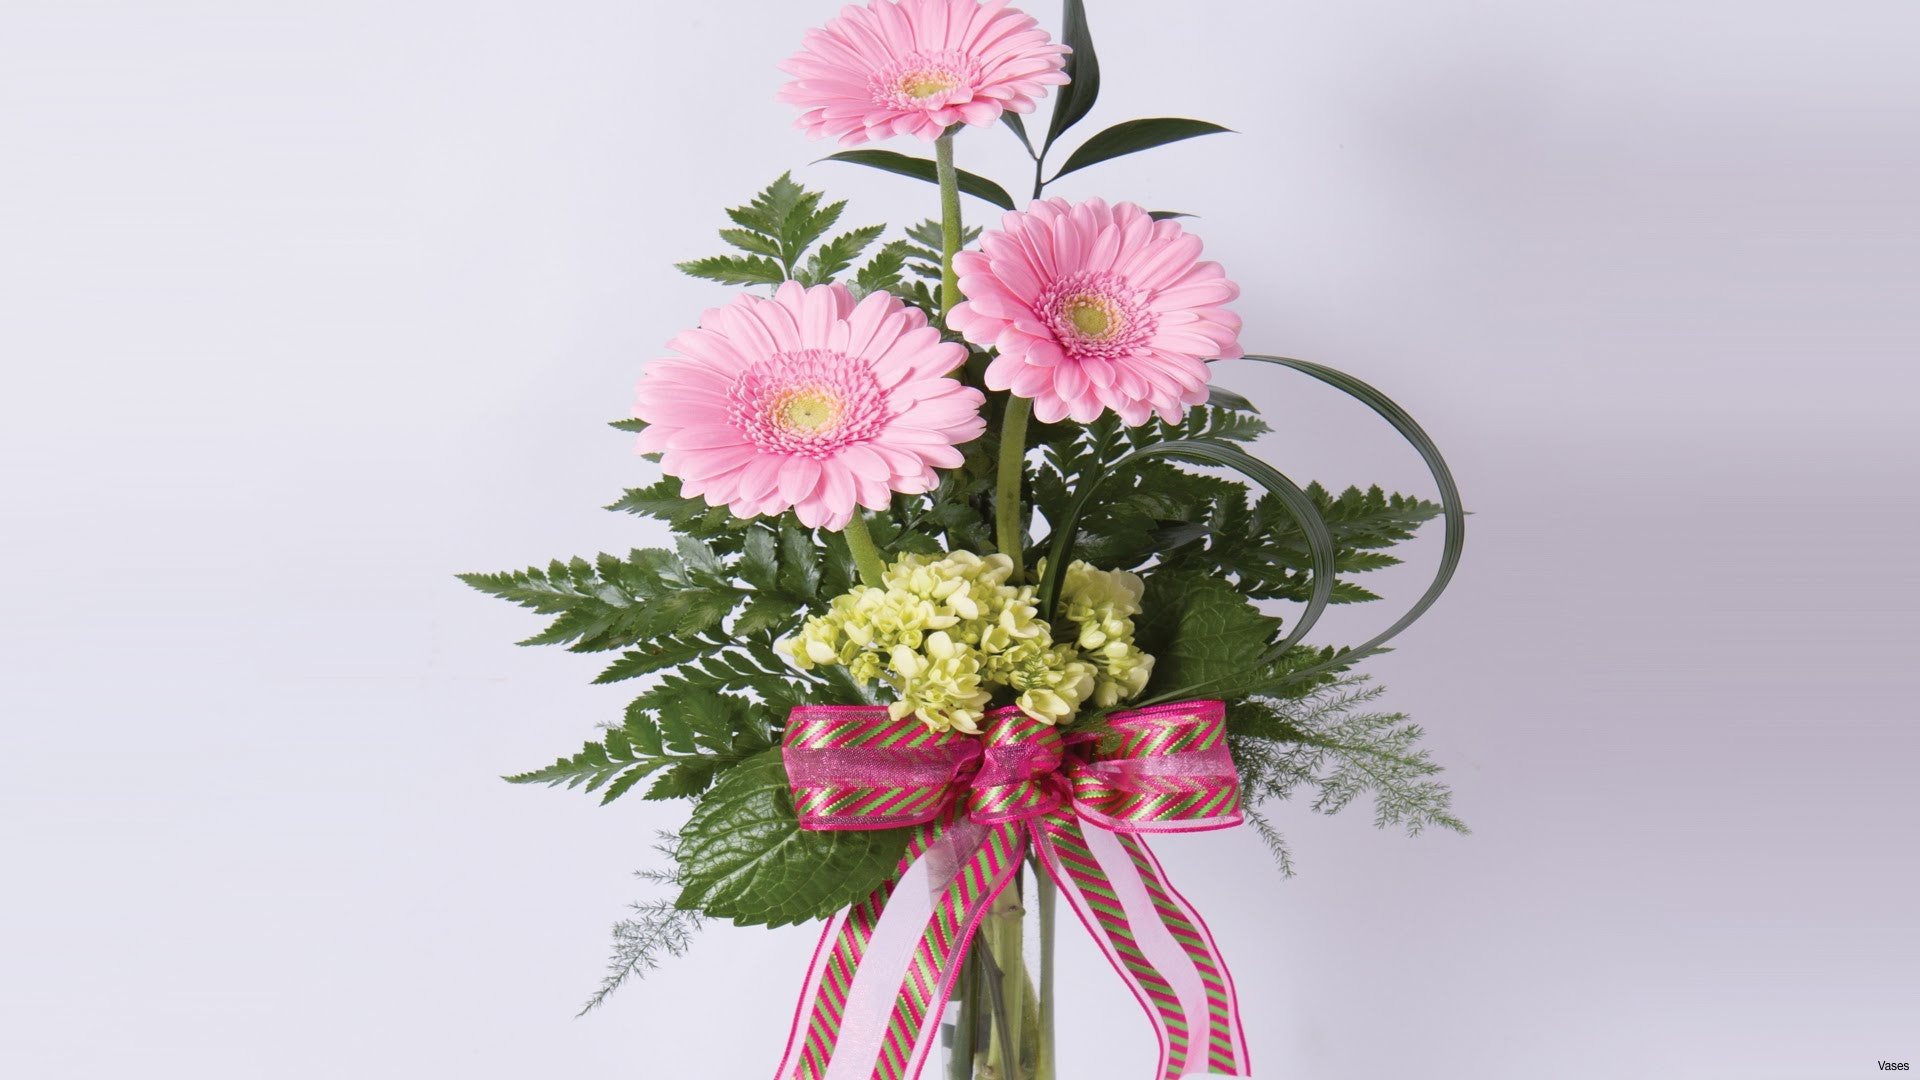 vw beetle vase ideas of flower vase stand images vase stand wood beautiful h vases bud vase for flower vase stand images vase stand wood beautiful h vases bud vase flower arrangements i 0d